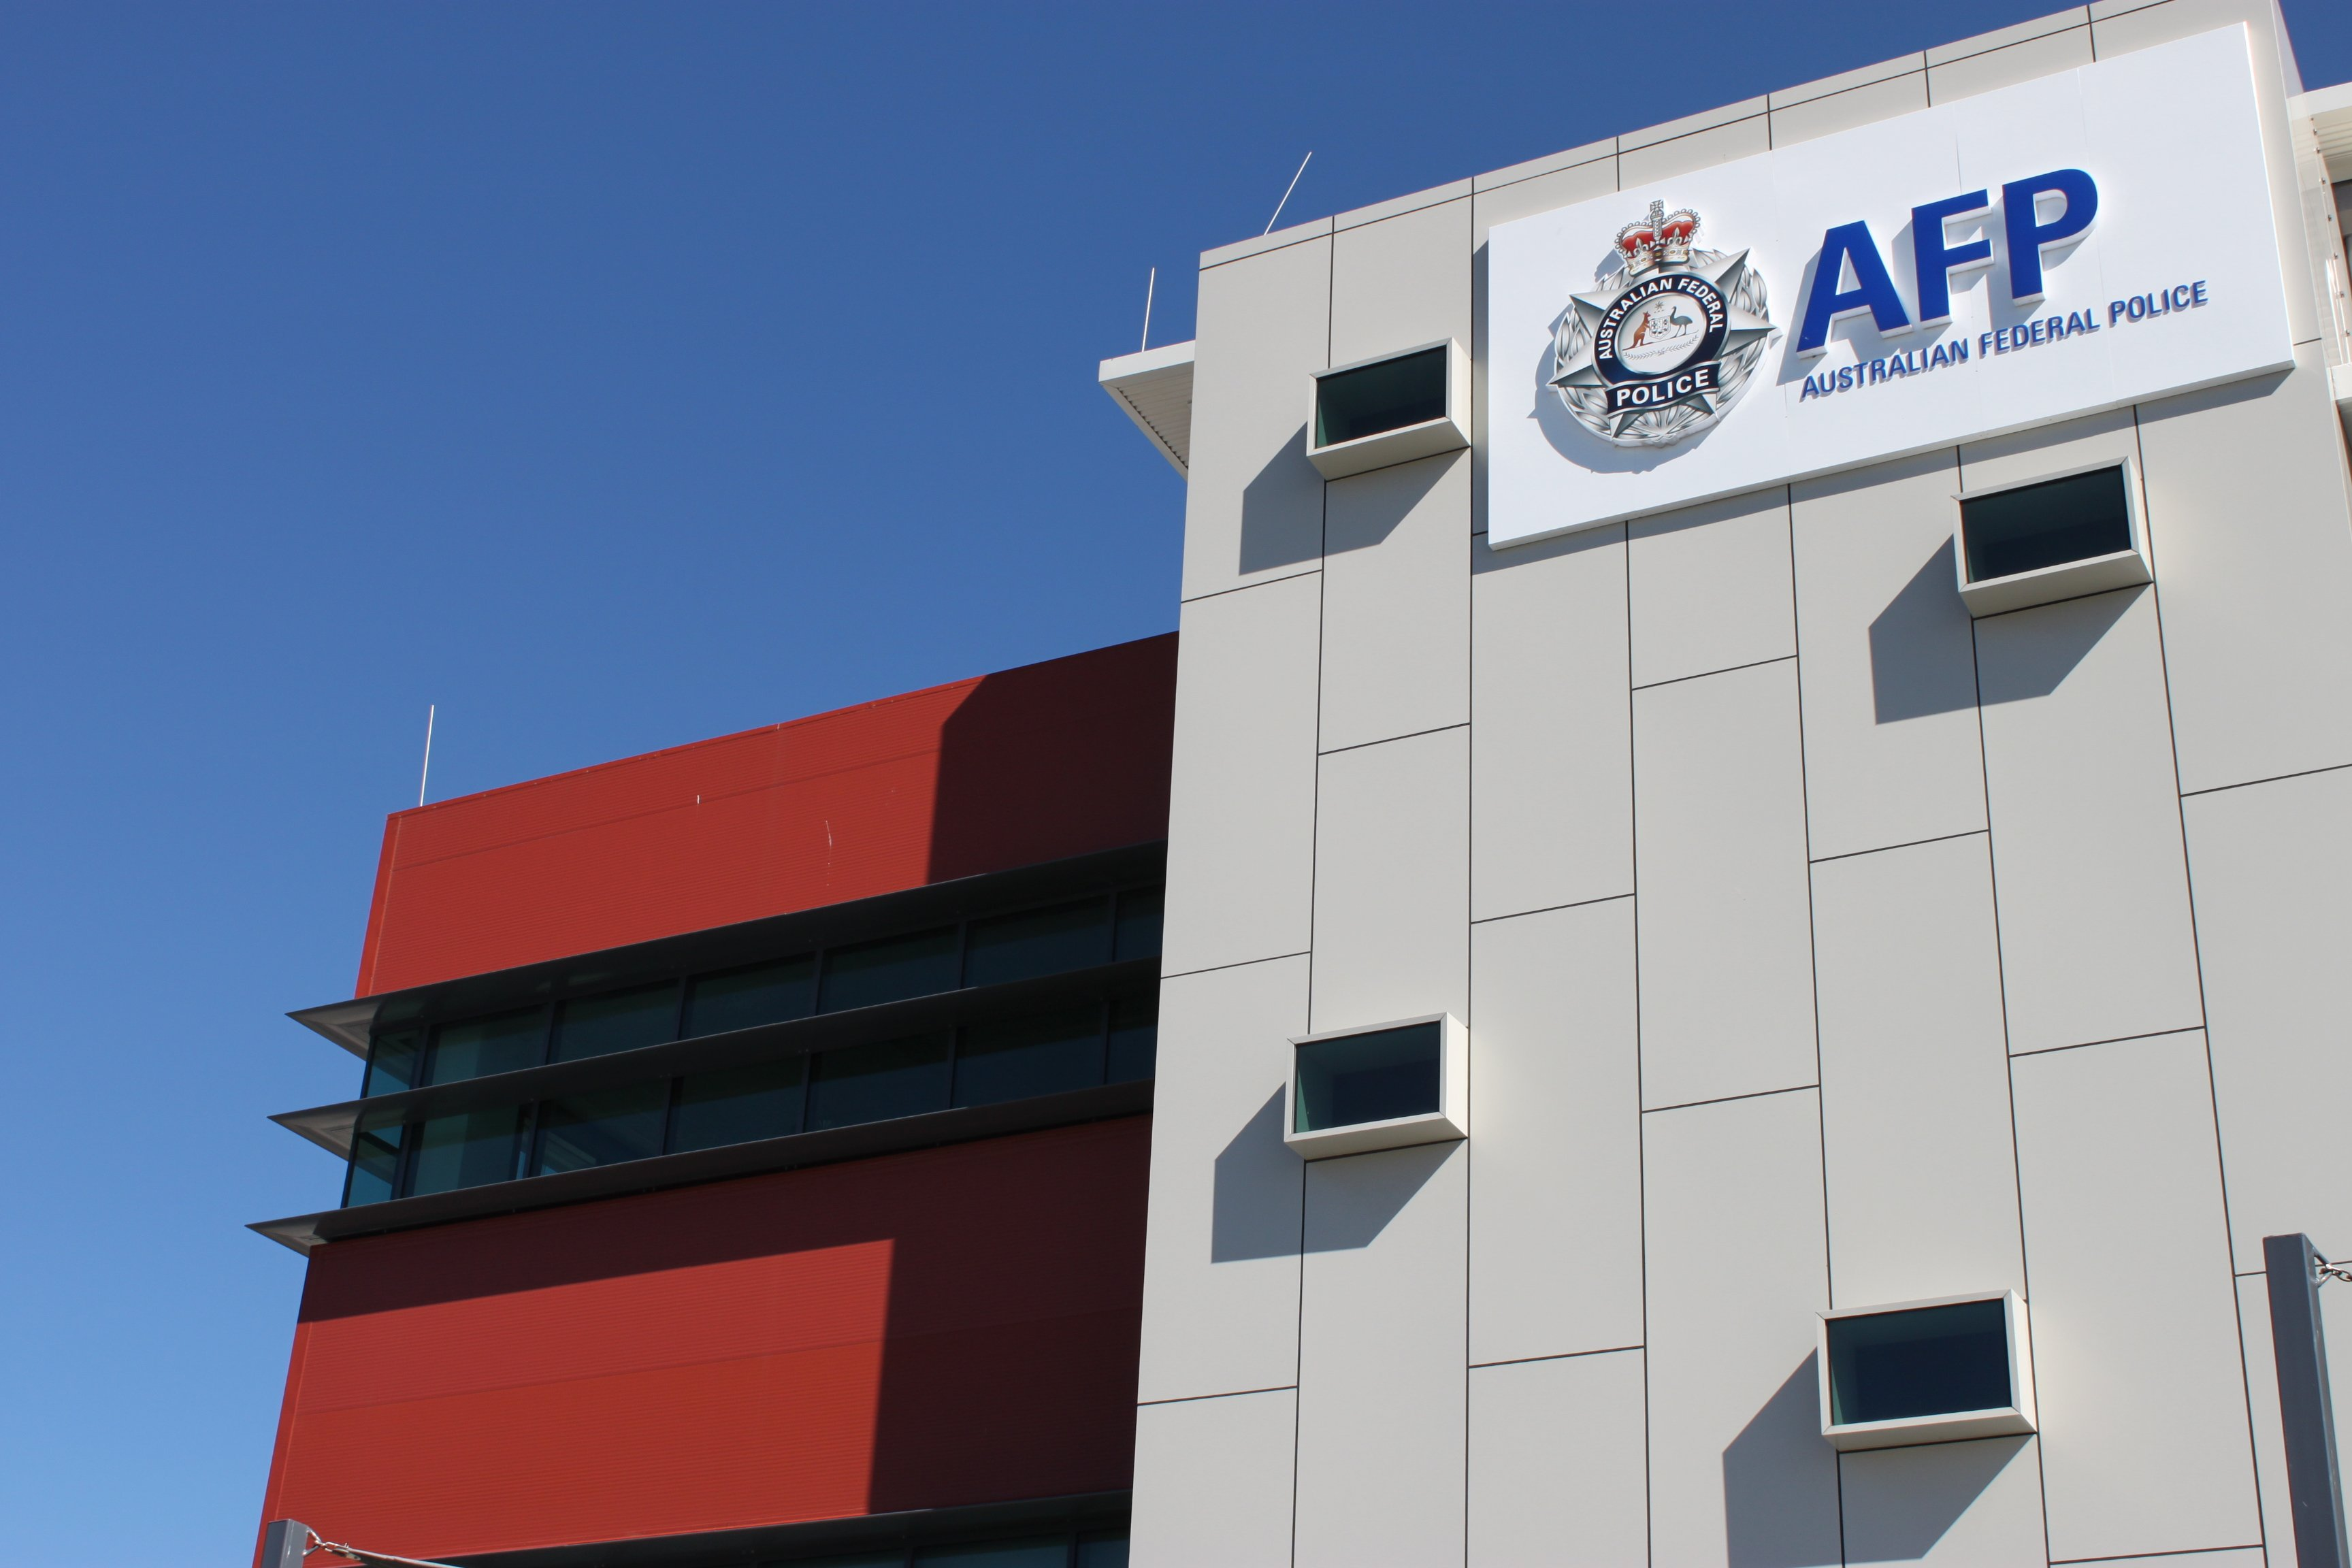 AFP Headquarters